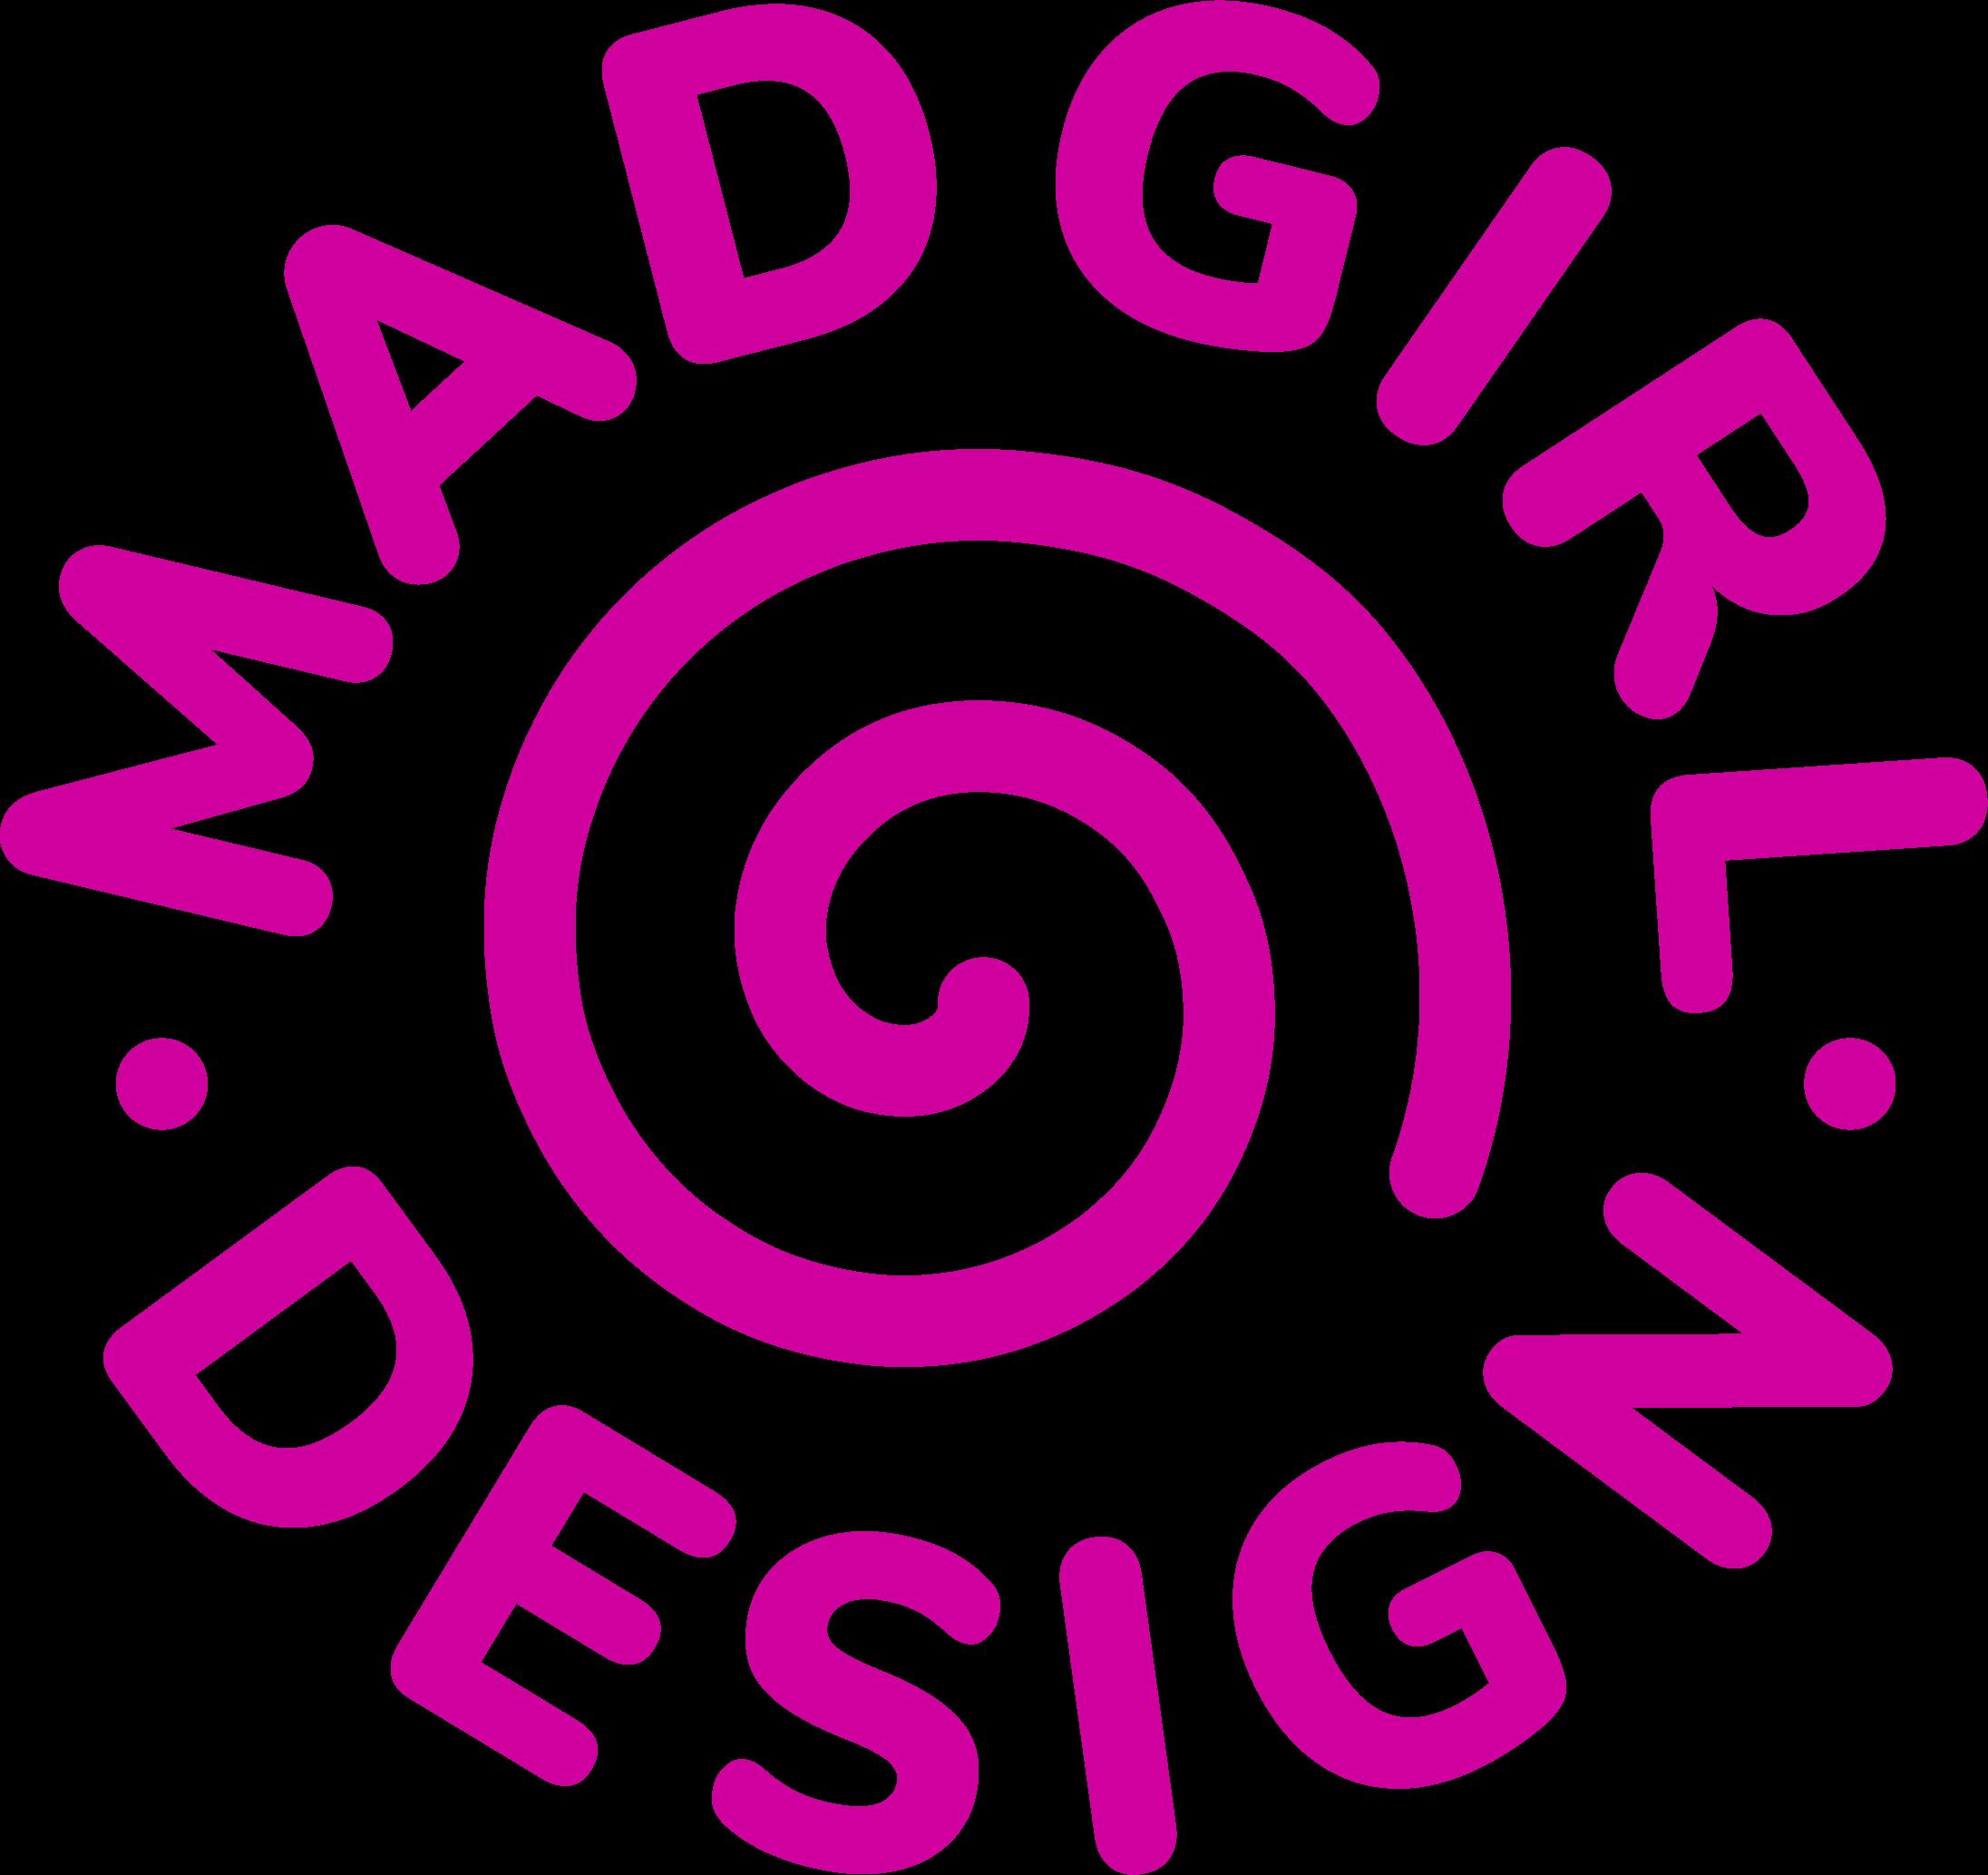 Mad Girl Design Logo in pink